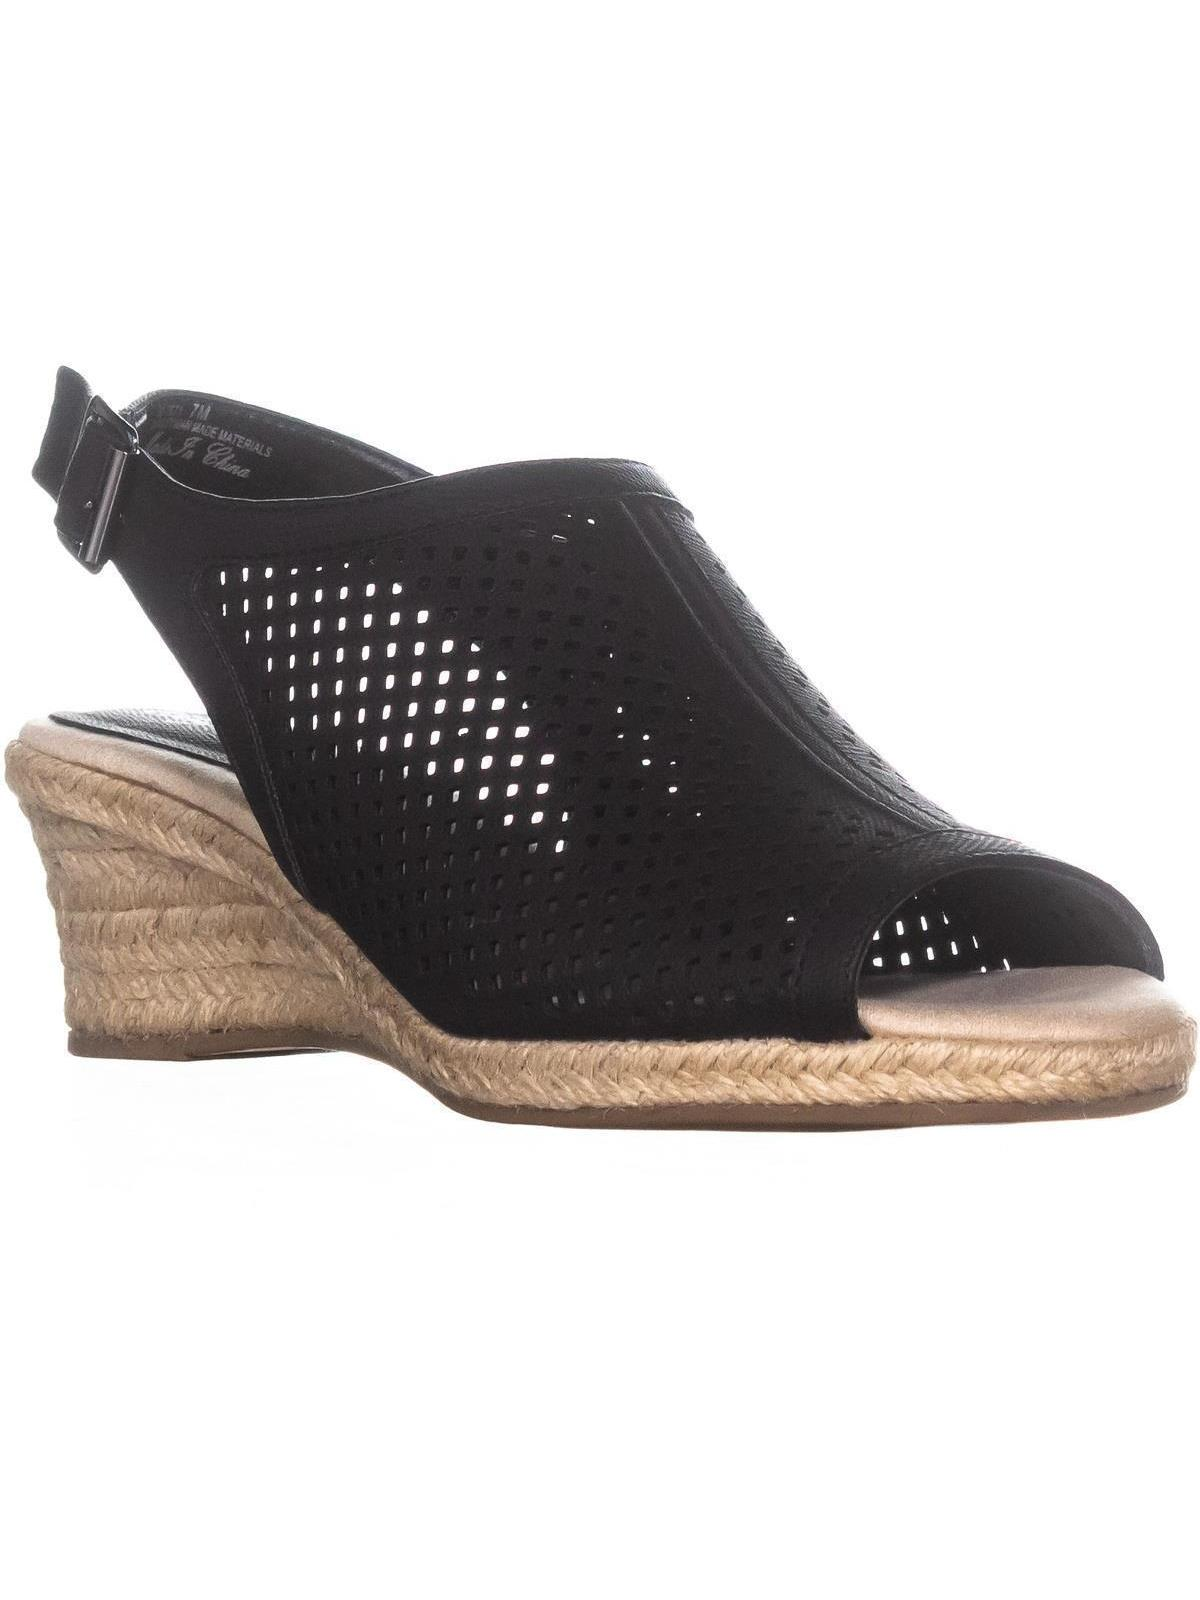 womens easy street stacy espadrilles sandals, black linen